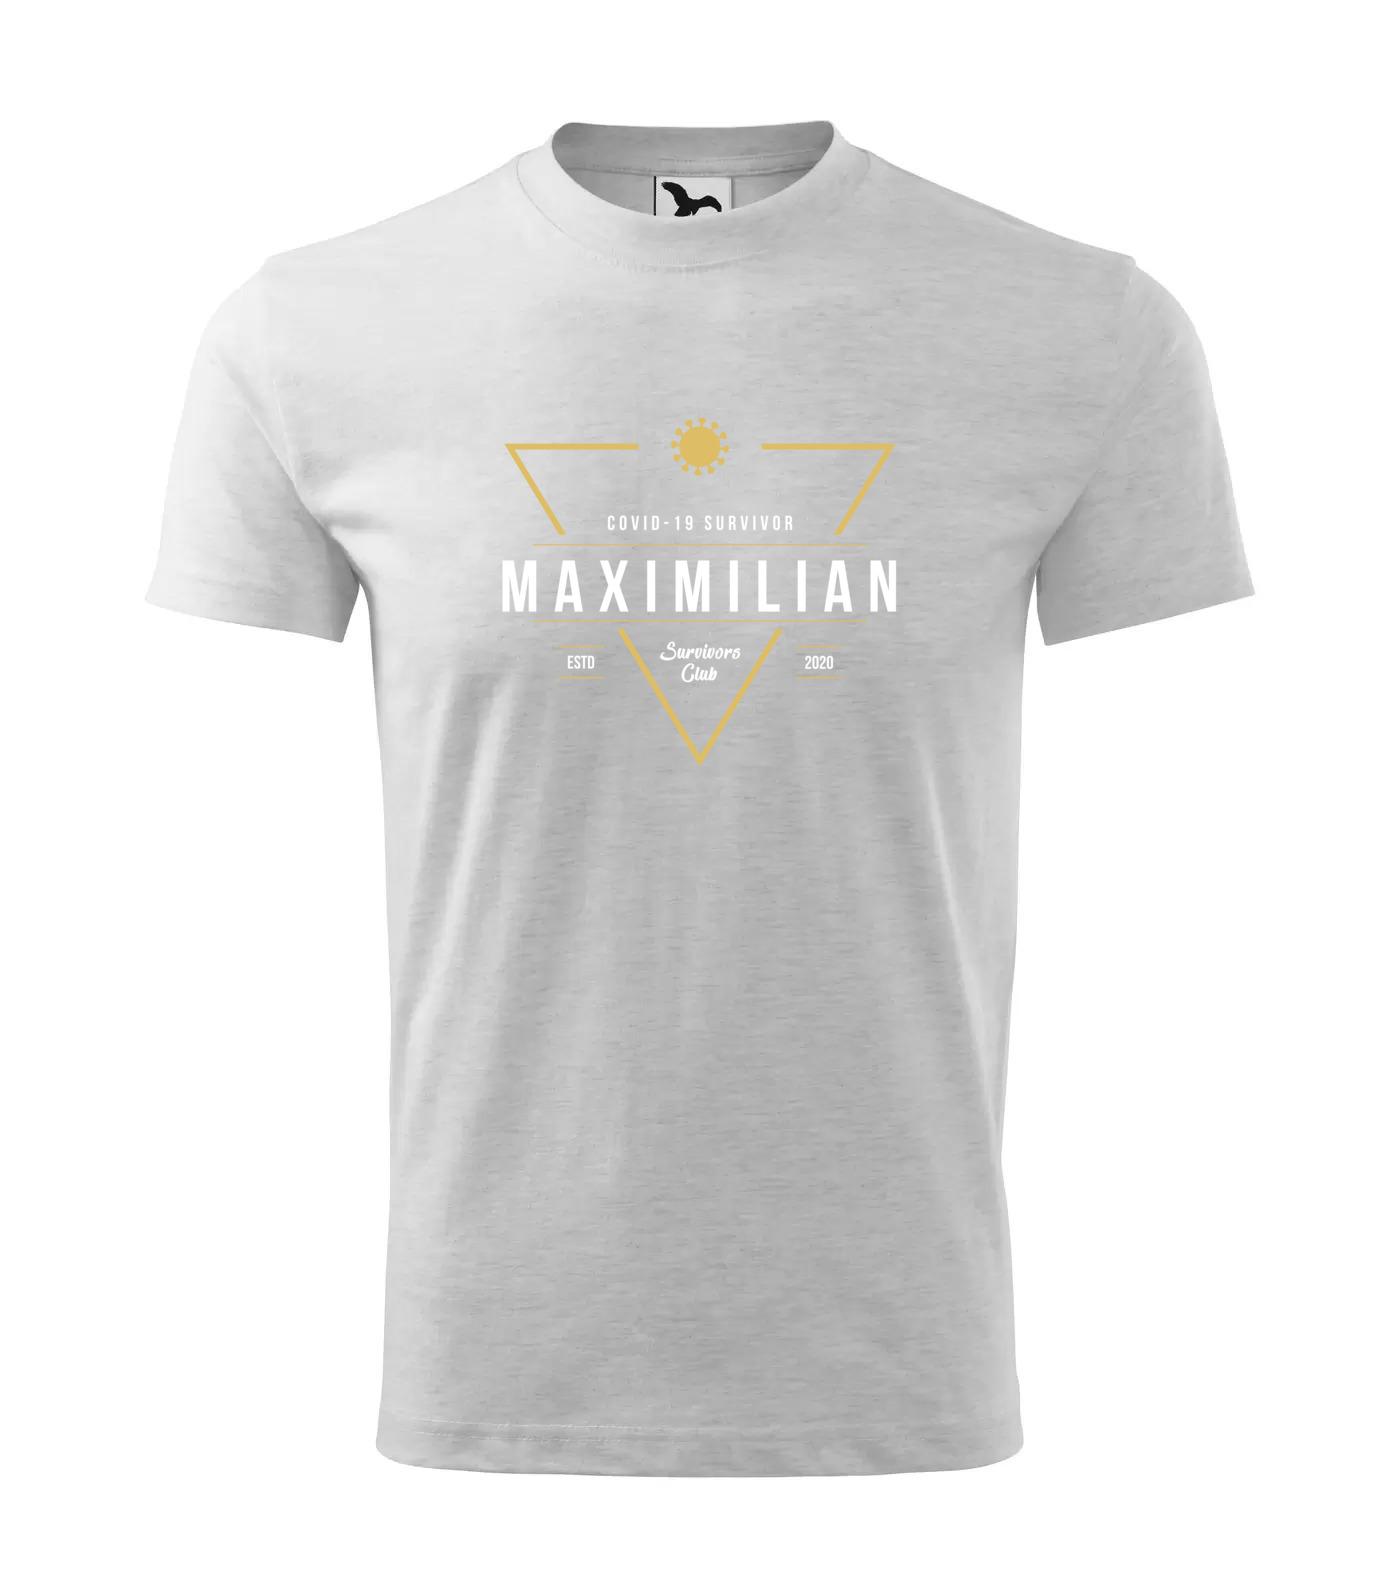 Tričko Survivor Club Maximilian